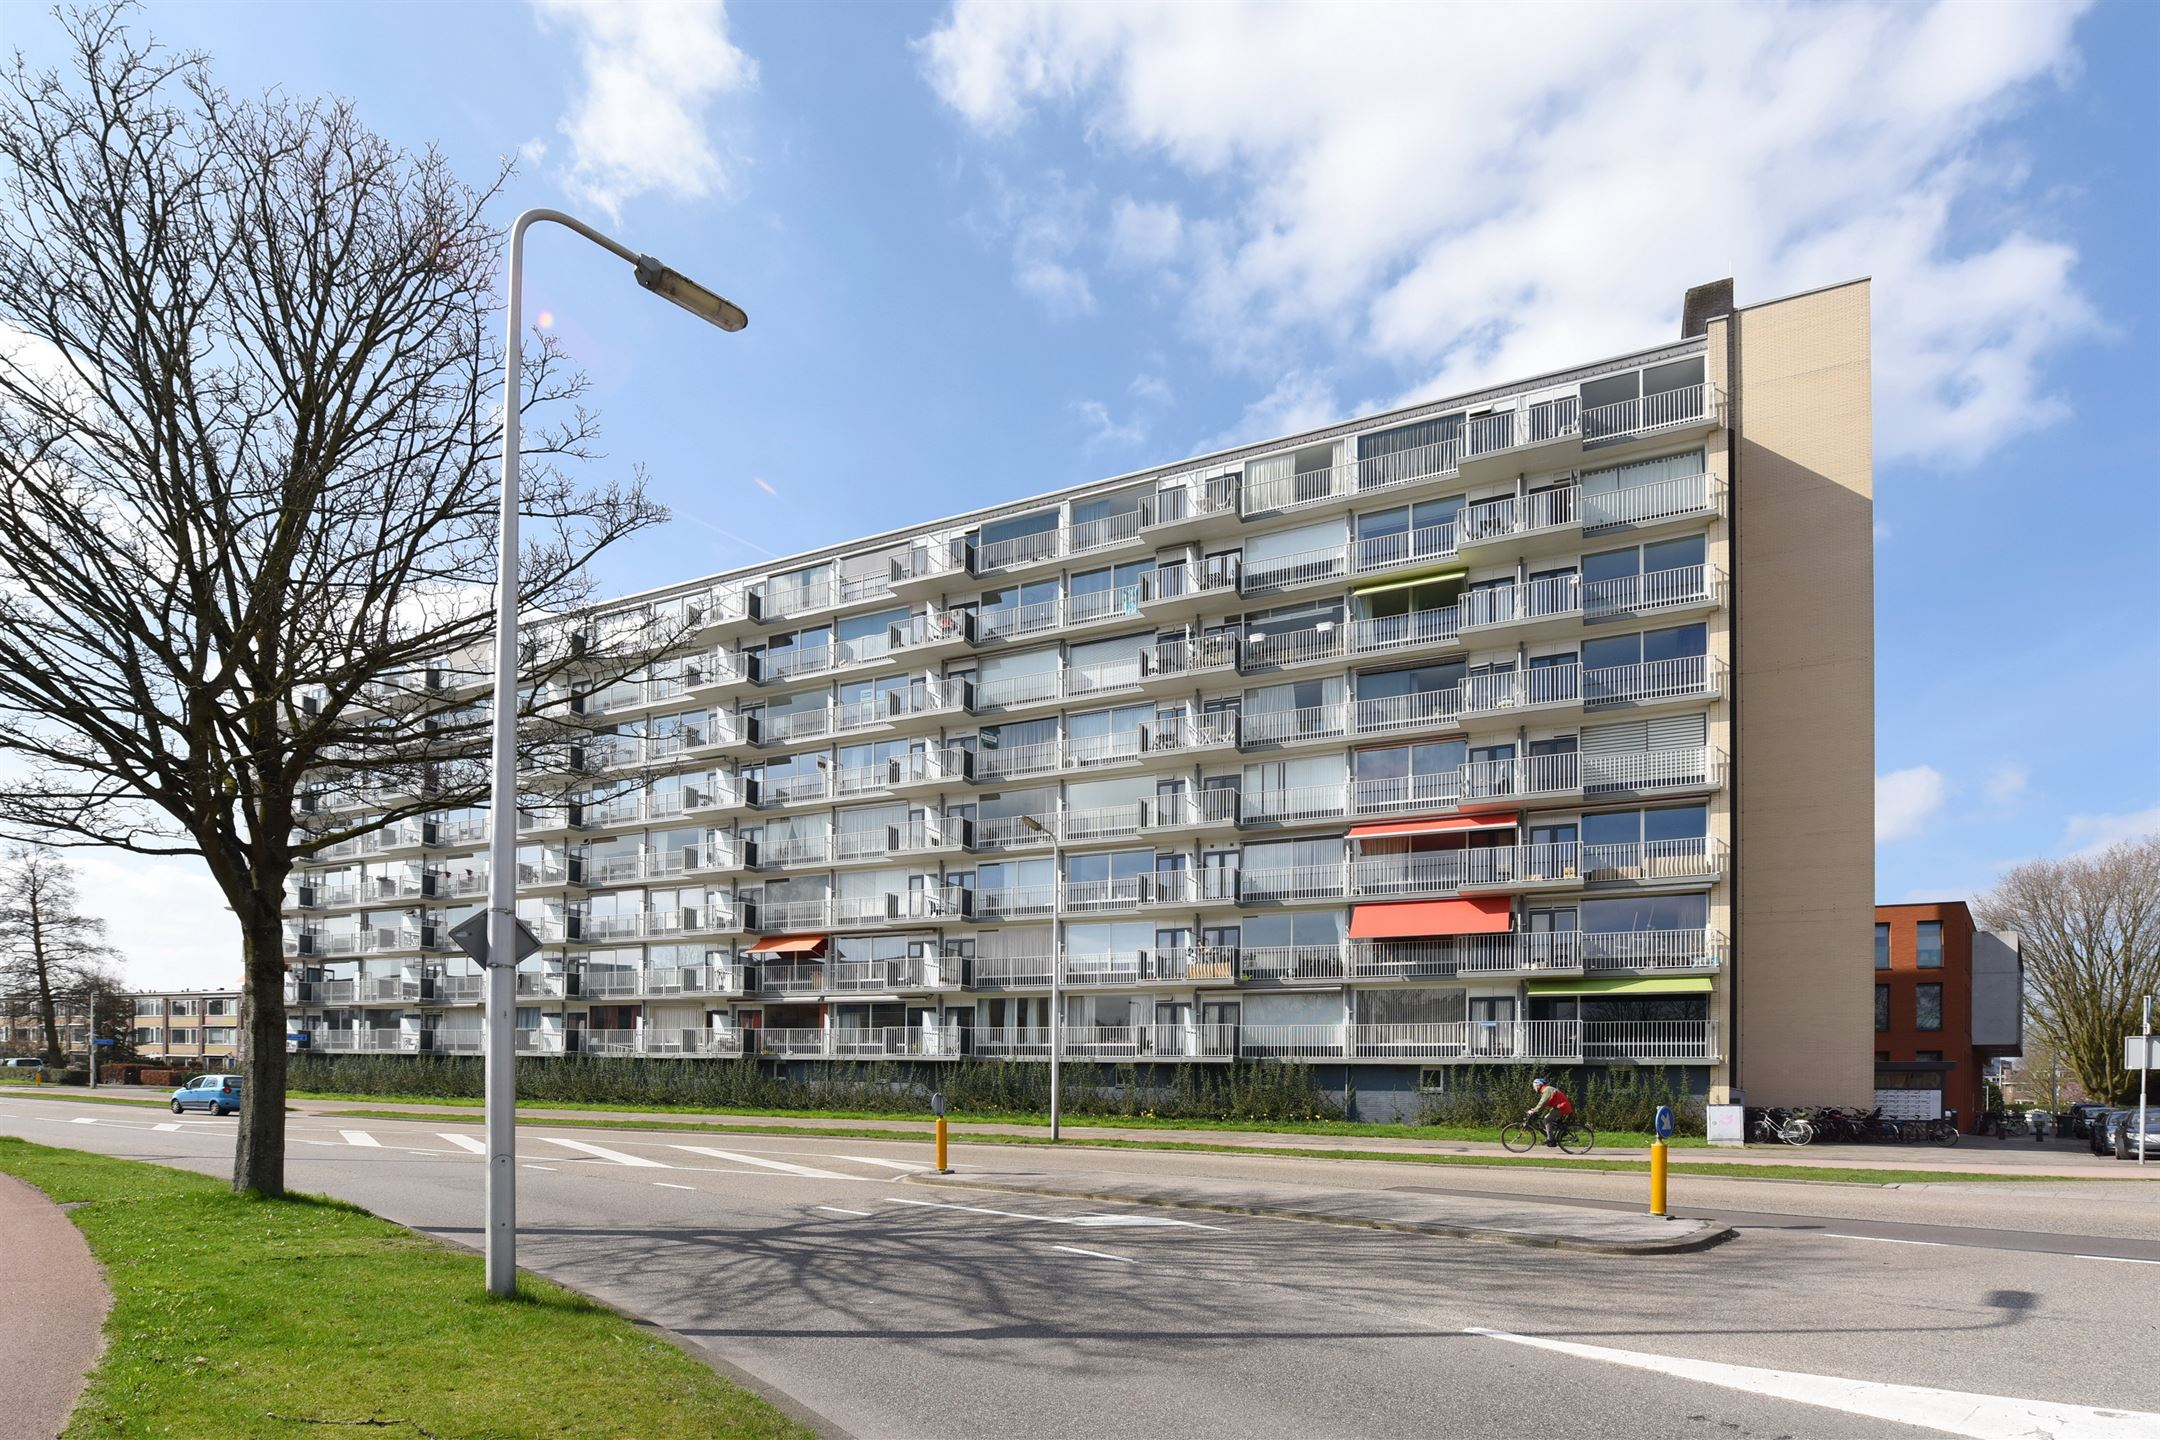 Verkocht rauwenhofflaan 76 3571 hj utrecht funda for Funda utrecht